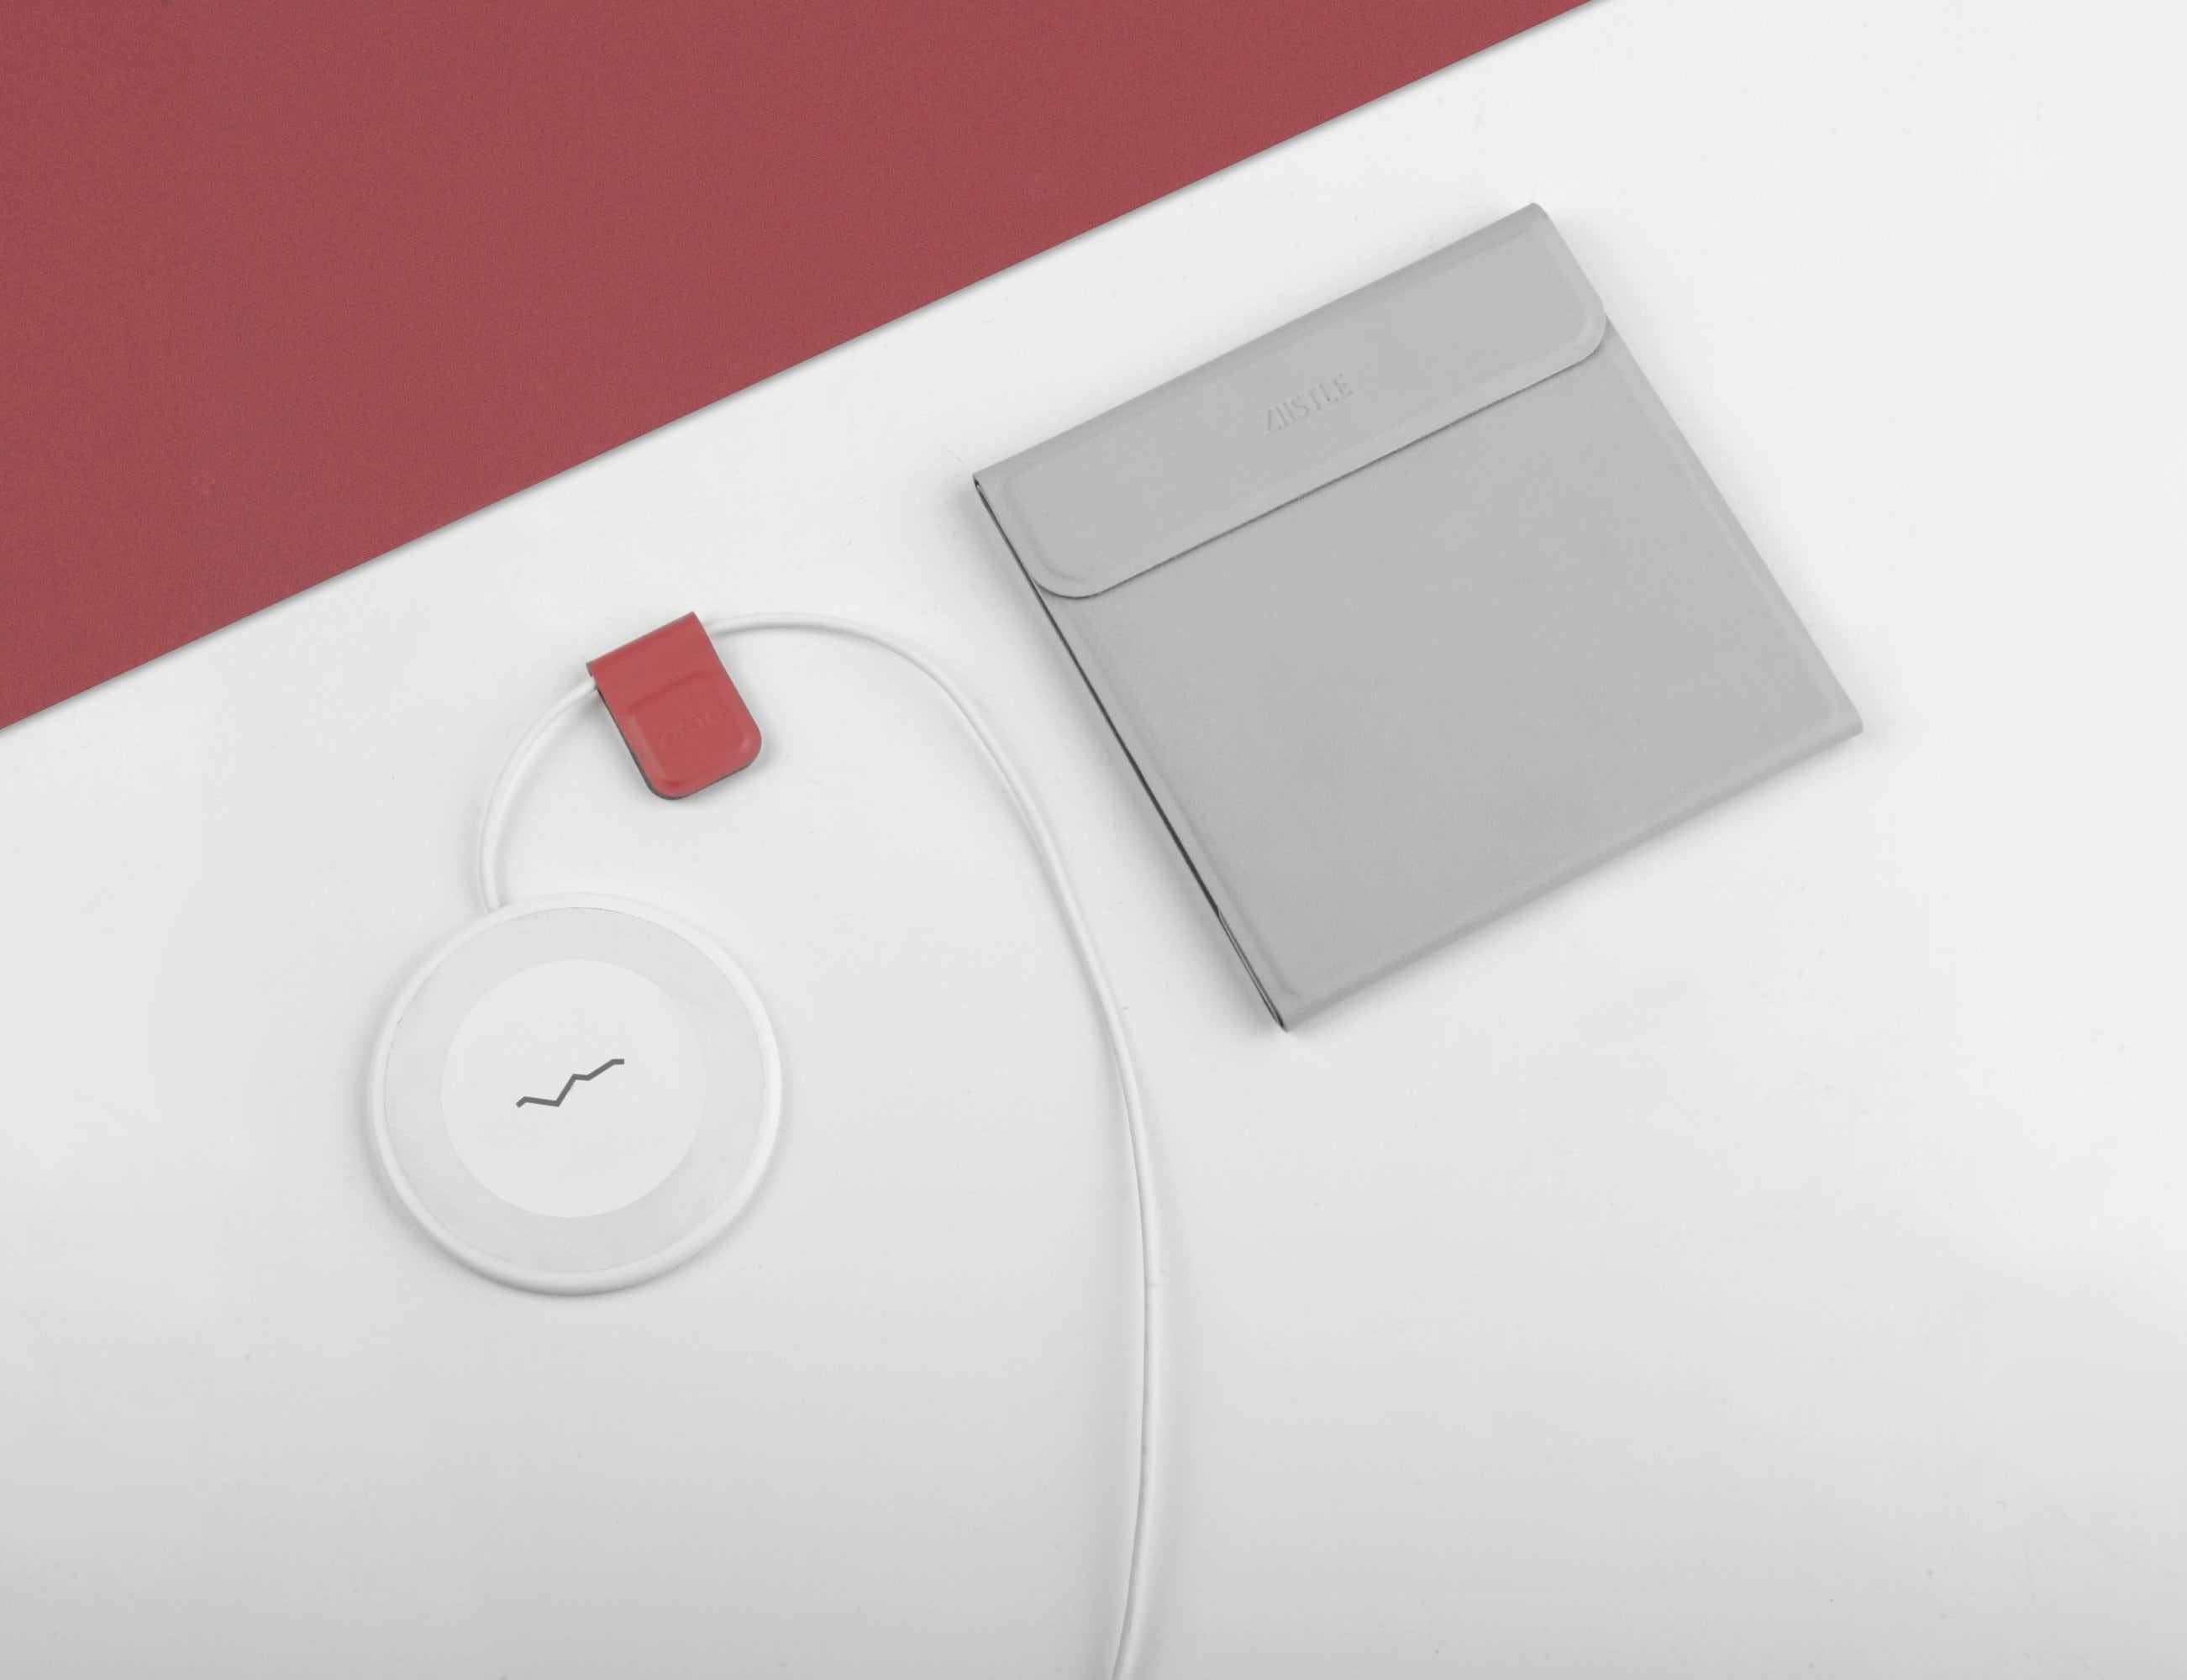 ZIISTLE Versatile Wireless Charger